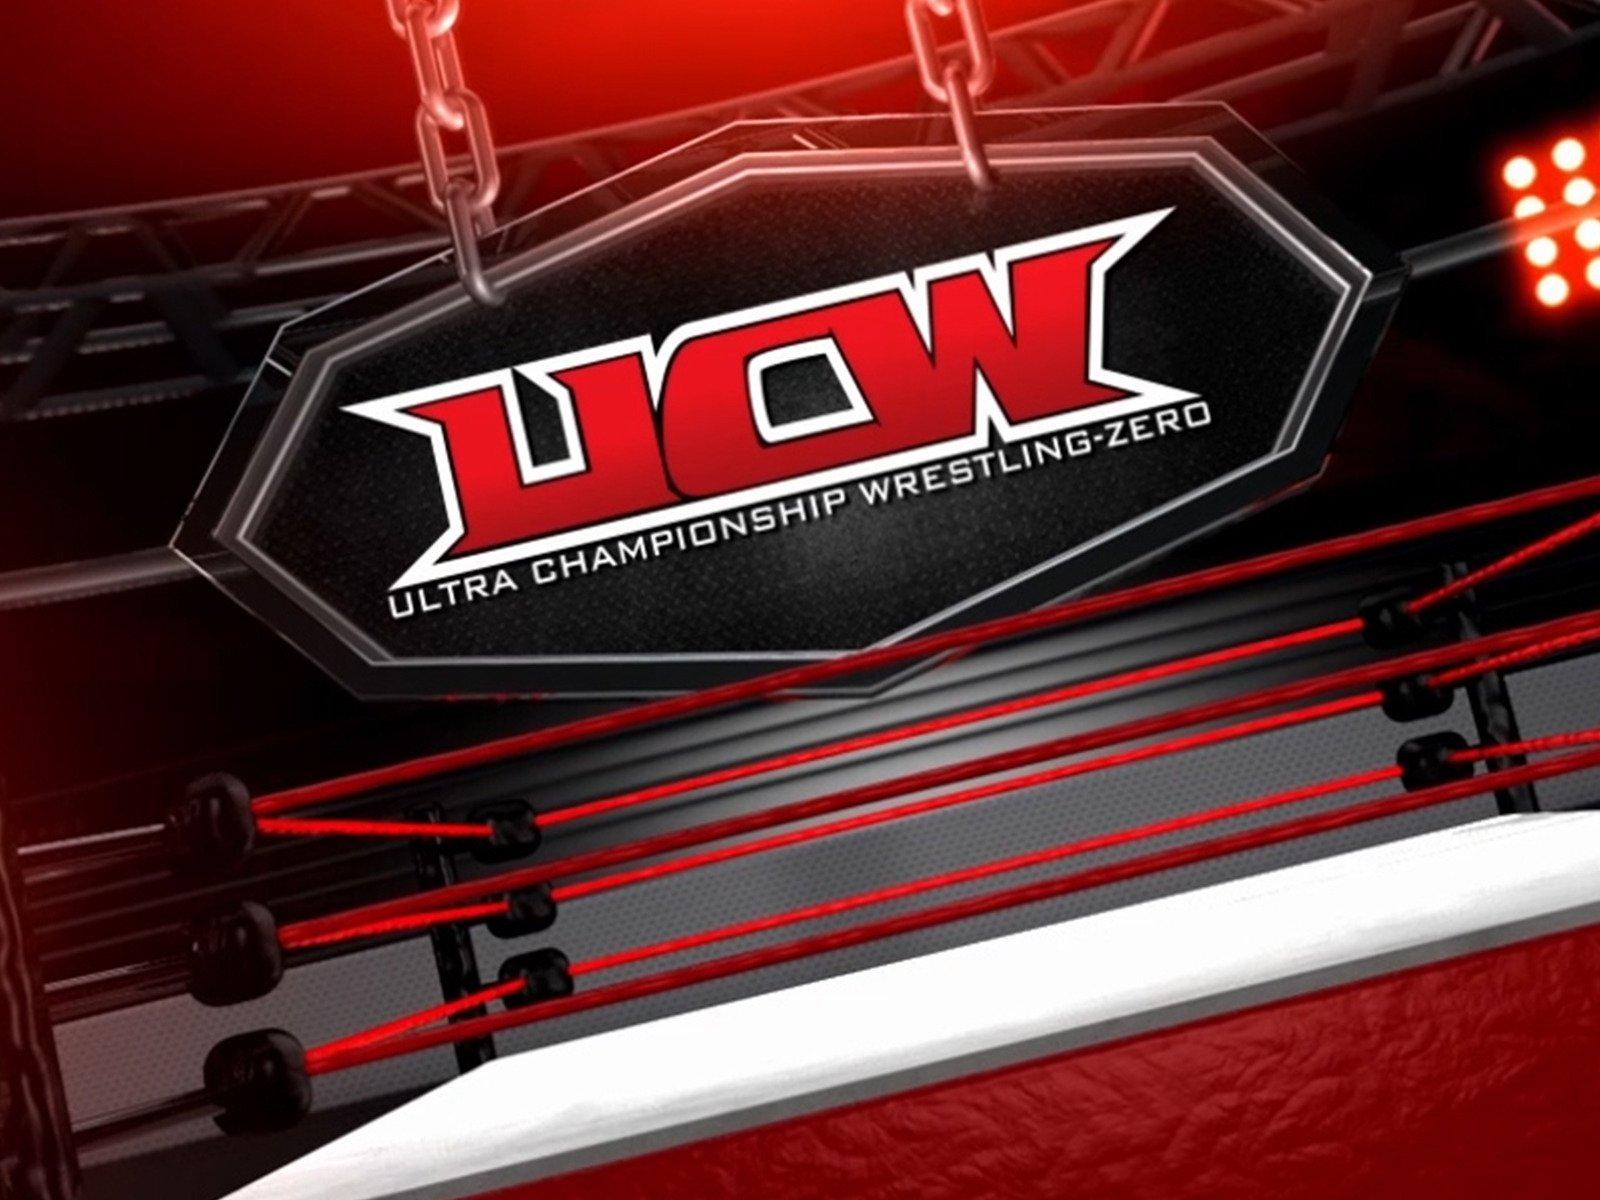 Ultra Championship Wrestling - Season 3